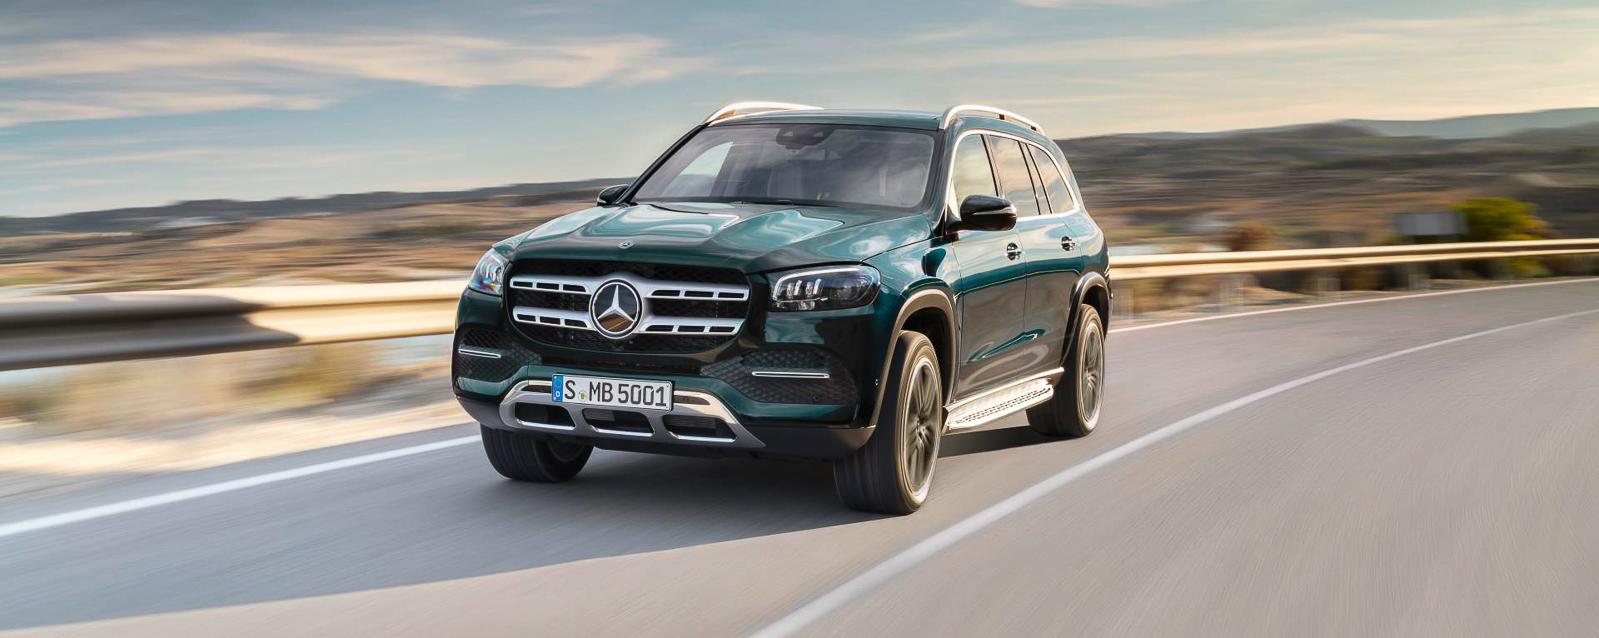 Mercedes-Benz GLS 2020 22